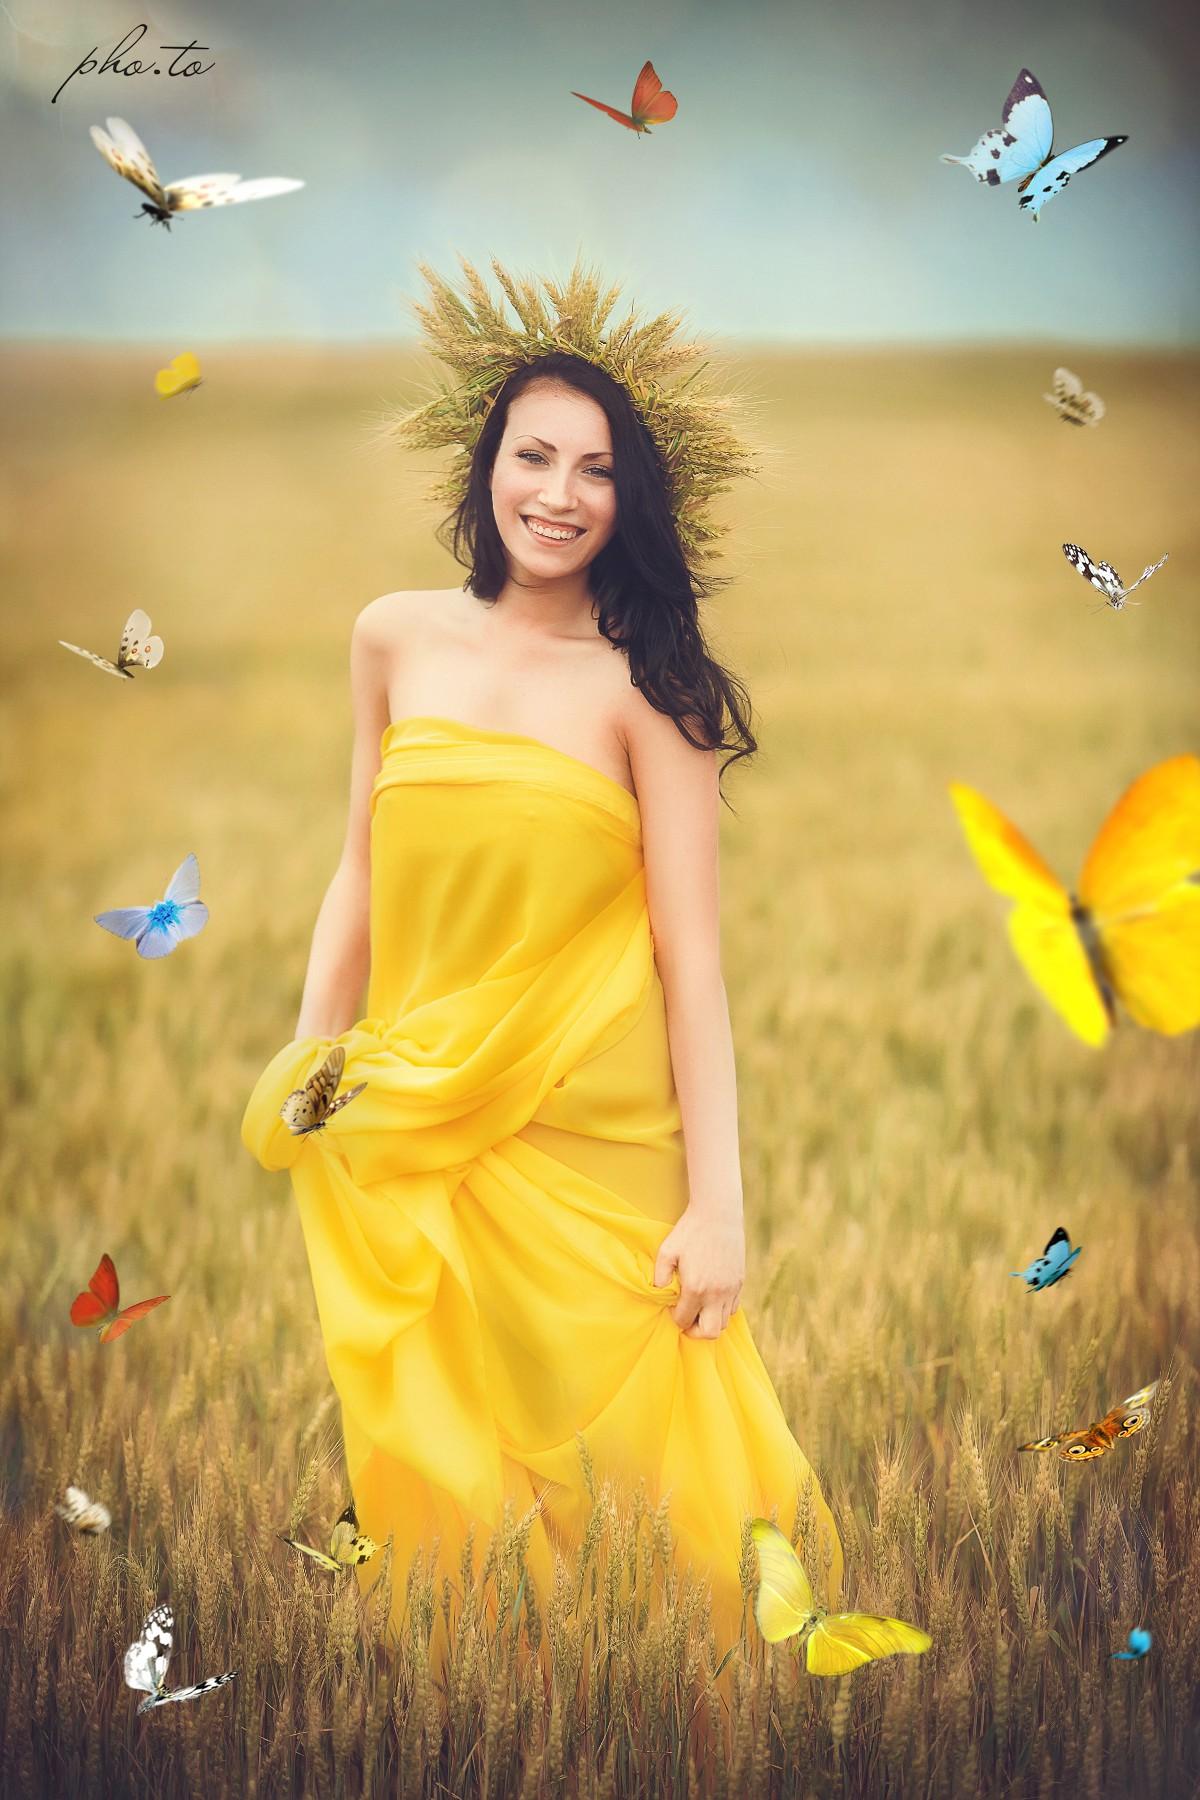 Summer shot of a beautiful girl adorned with butterflies overlay